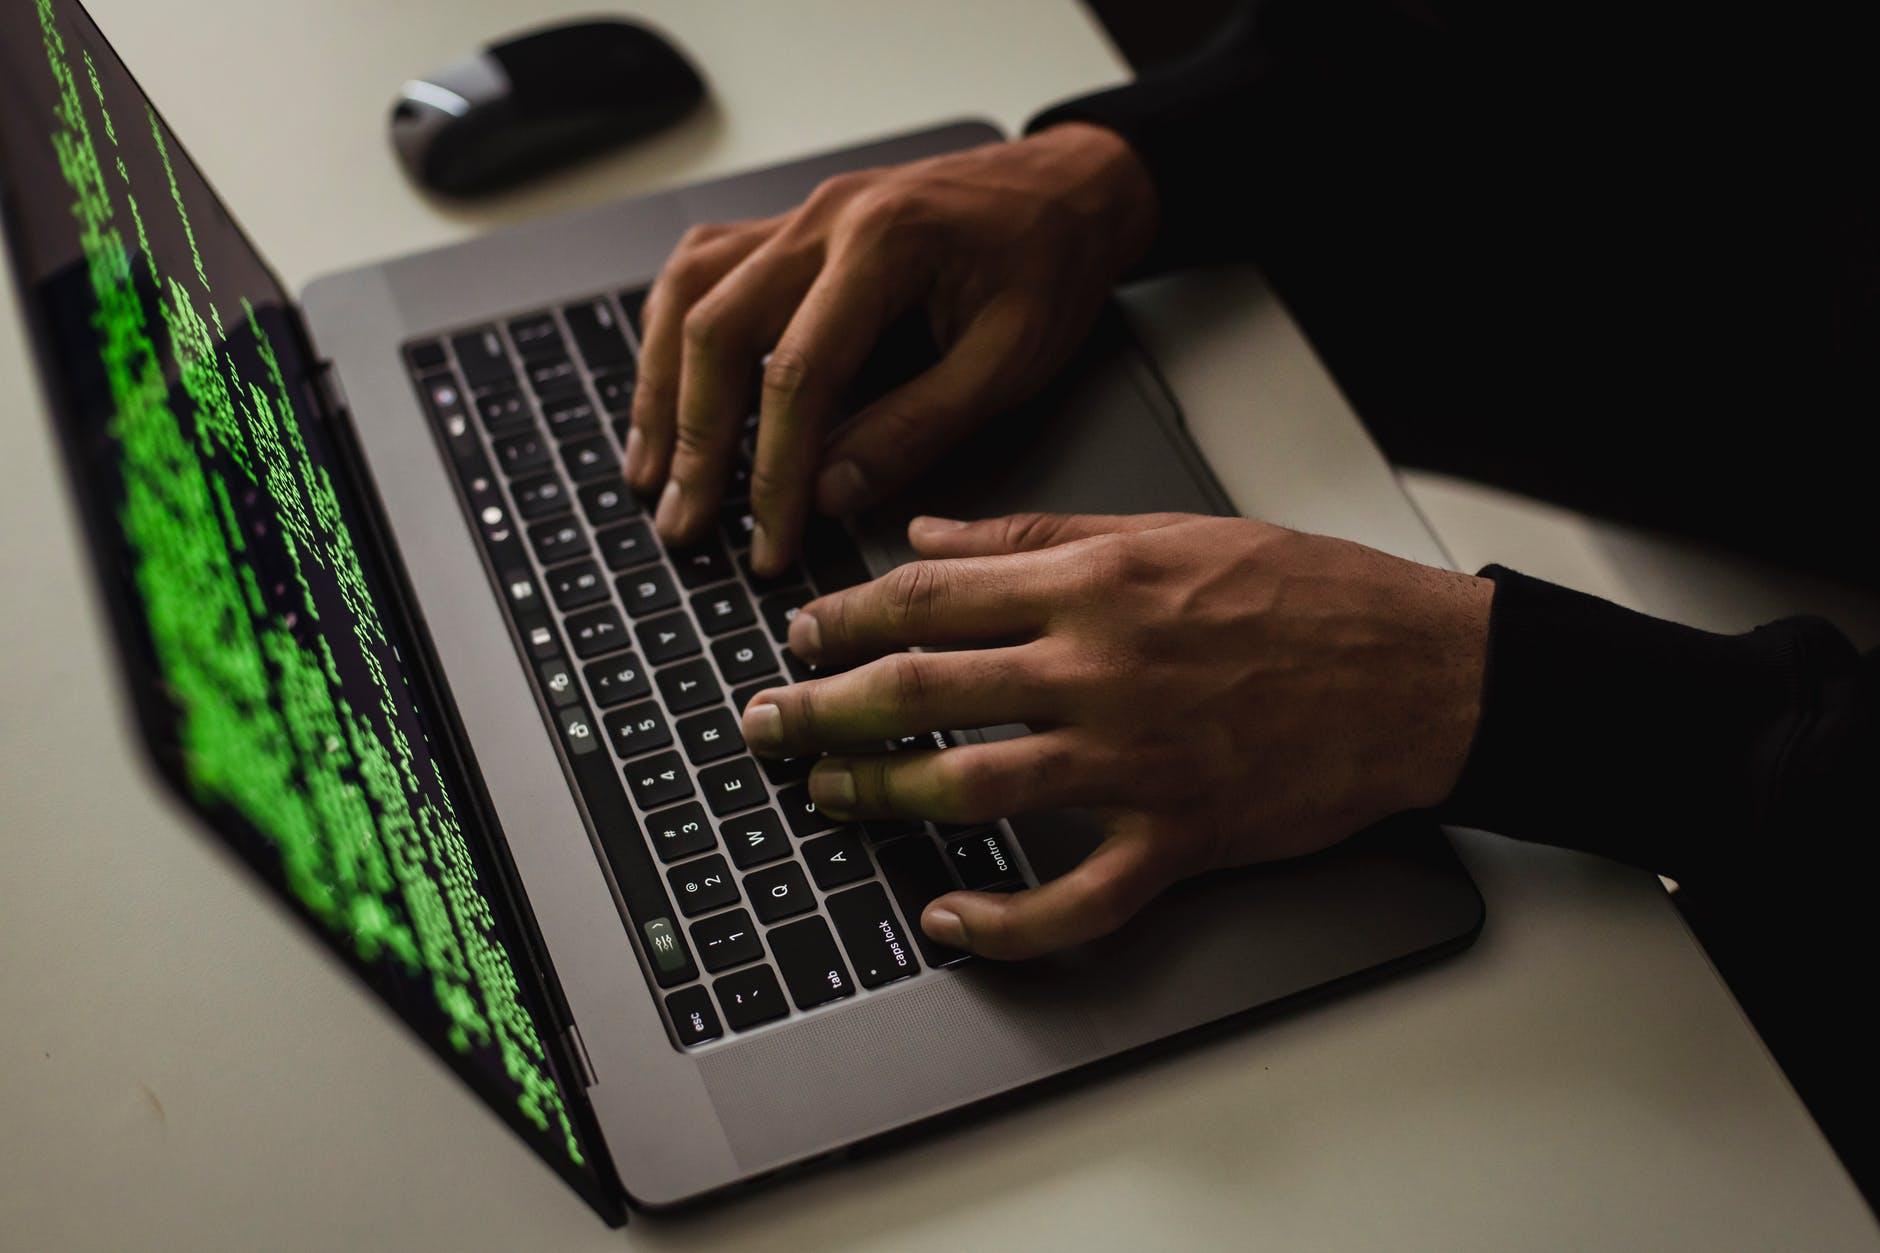 tanaman sistem peretasan mata-mata cyber saat mengetik di laptop